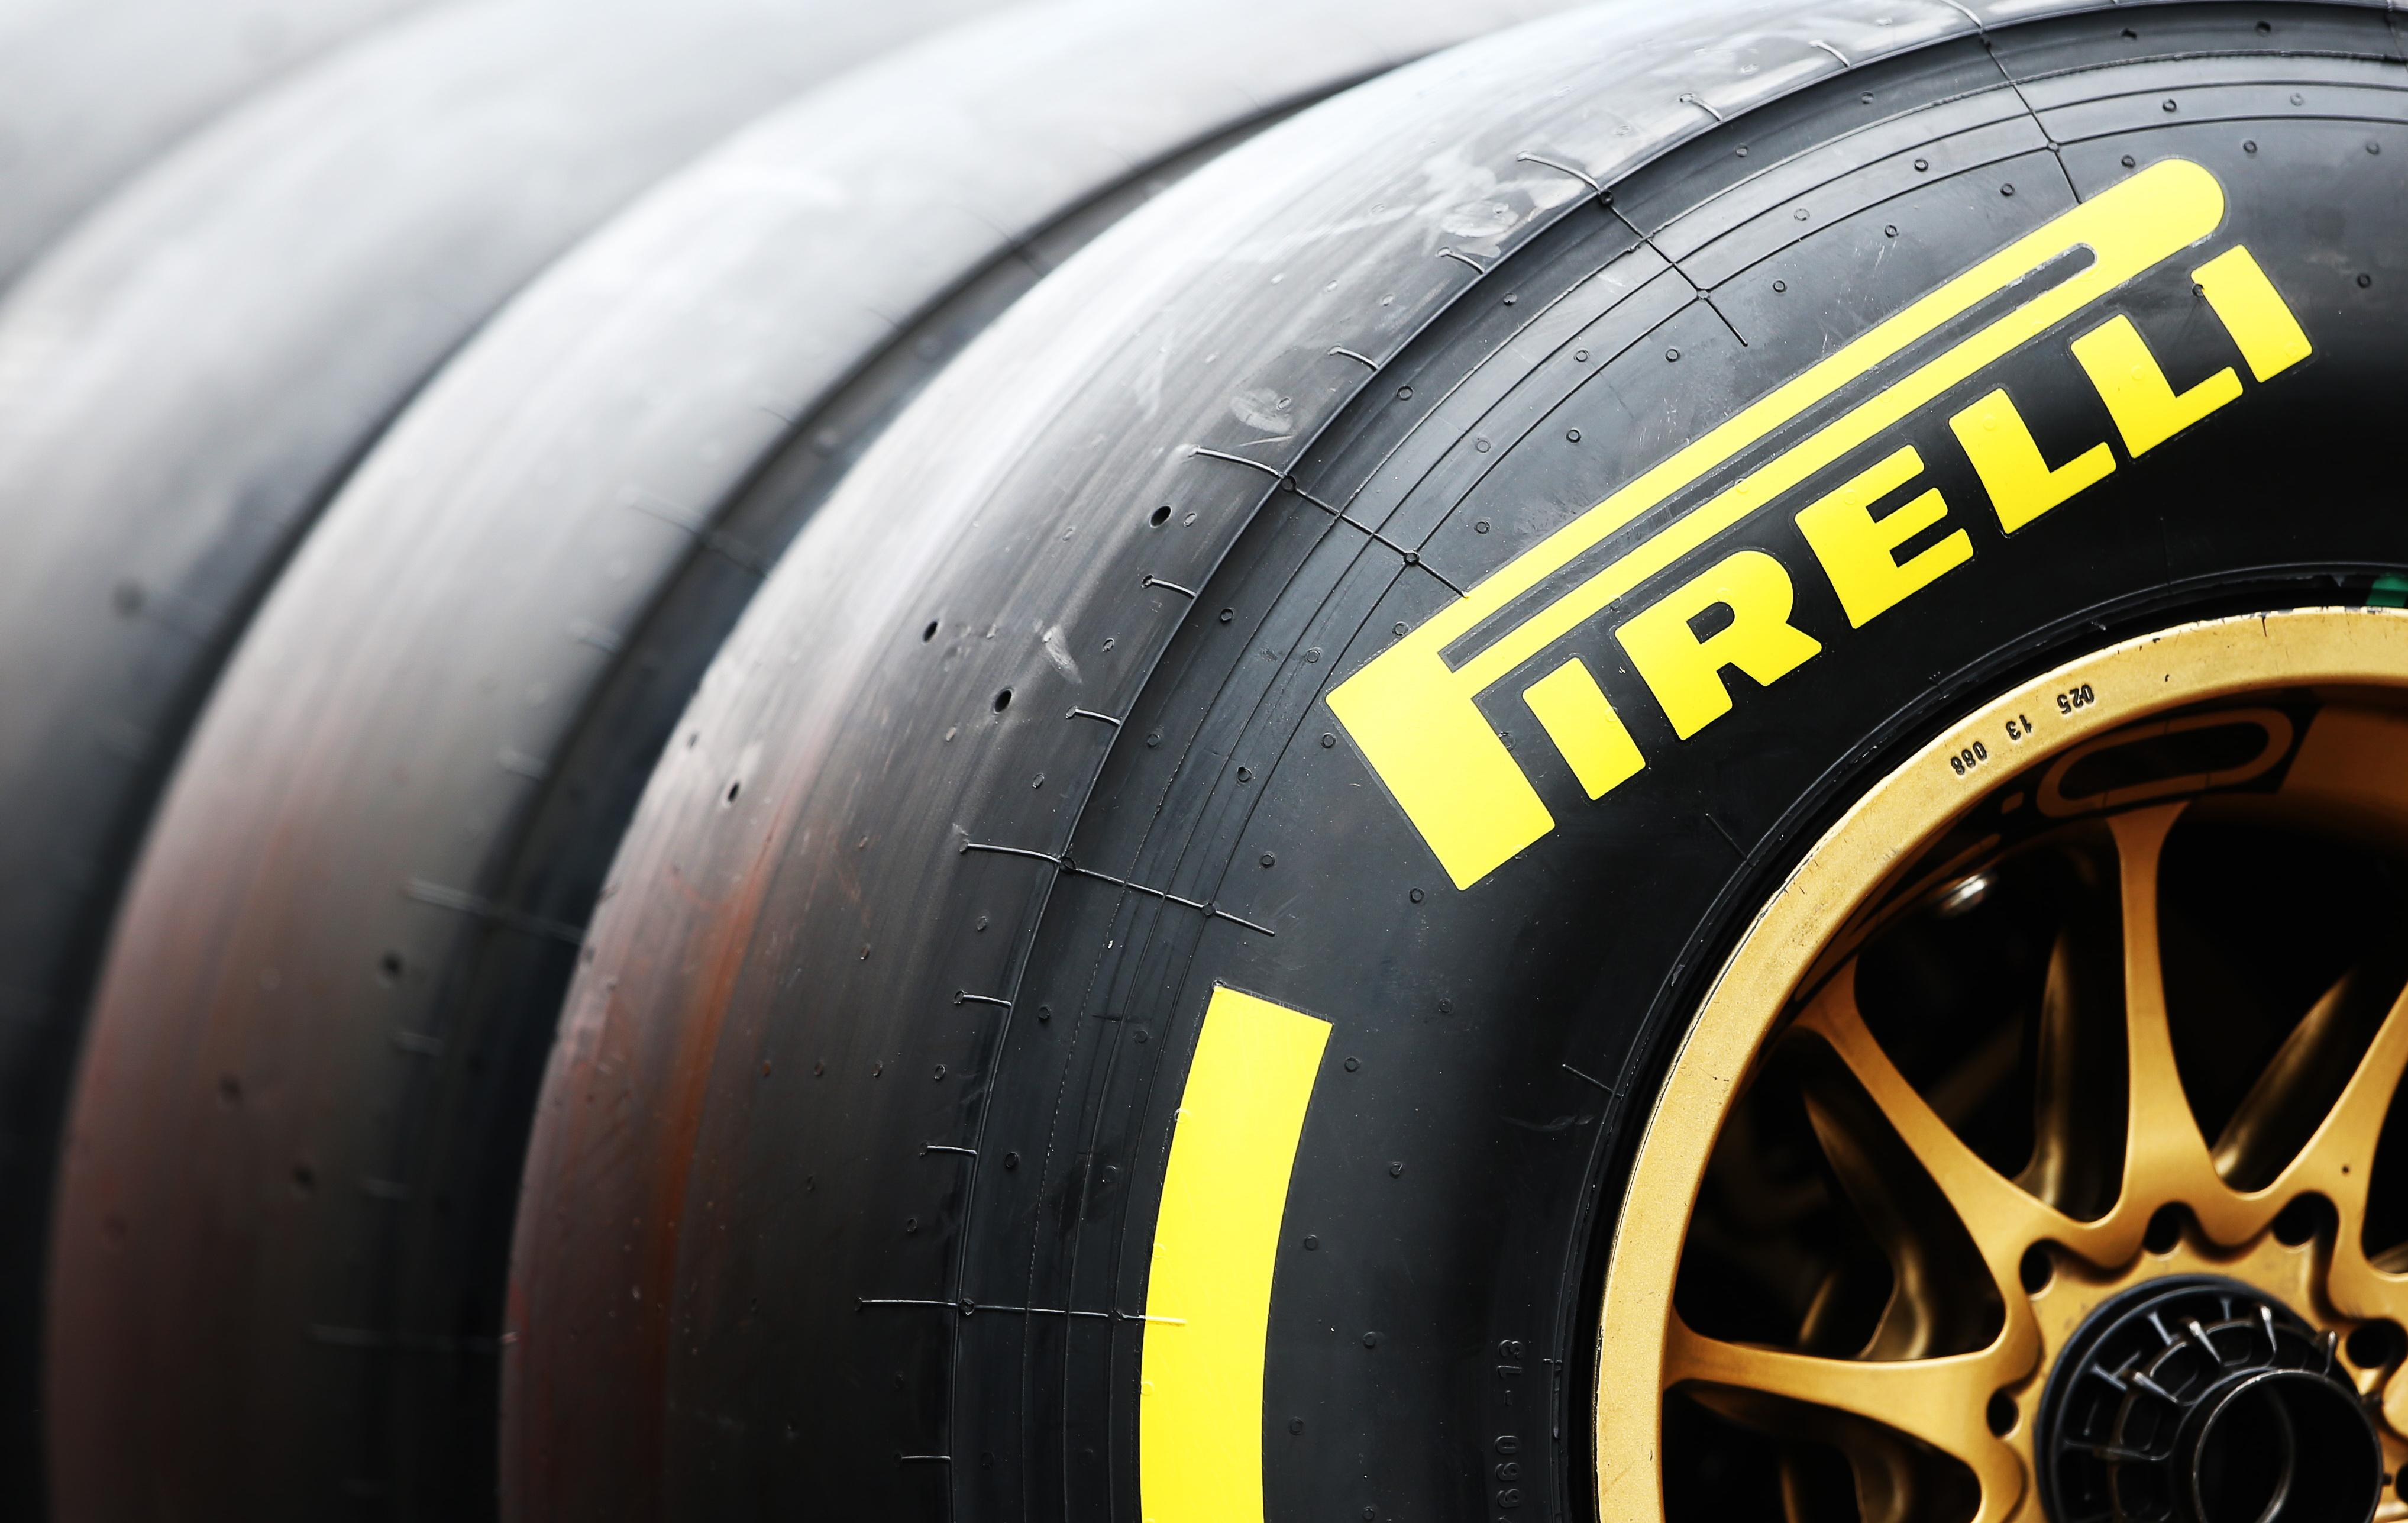 pirelli renforce ses pneus formule 1 auto moto. Black Bedroom Furniture Sets. Home Design Ideas